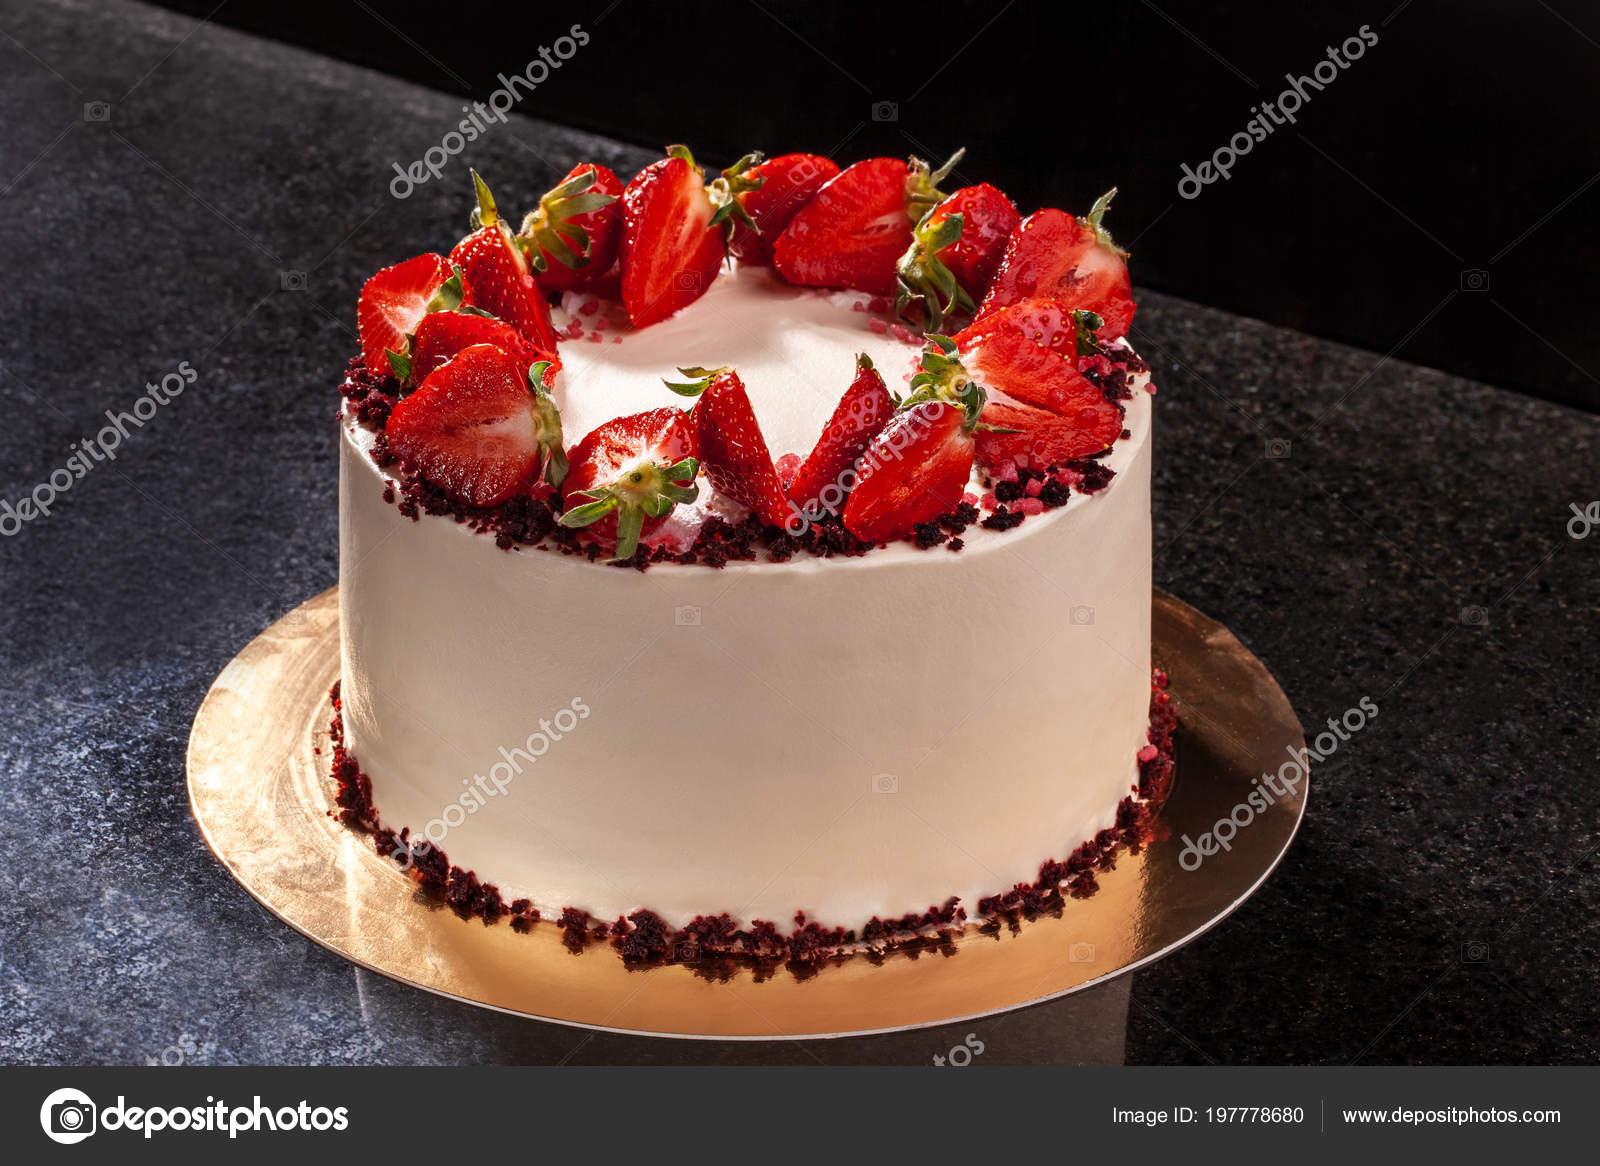 Tarta De Queso Con Fresas Pastel Decorado Con Fresas Delicioso